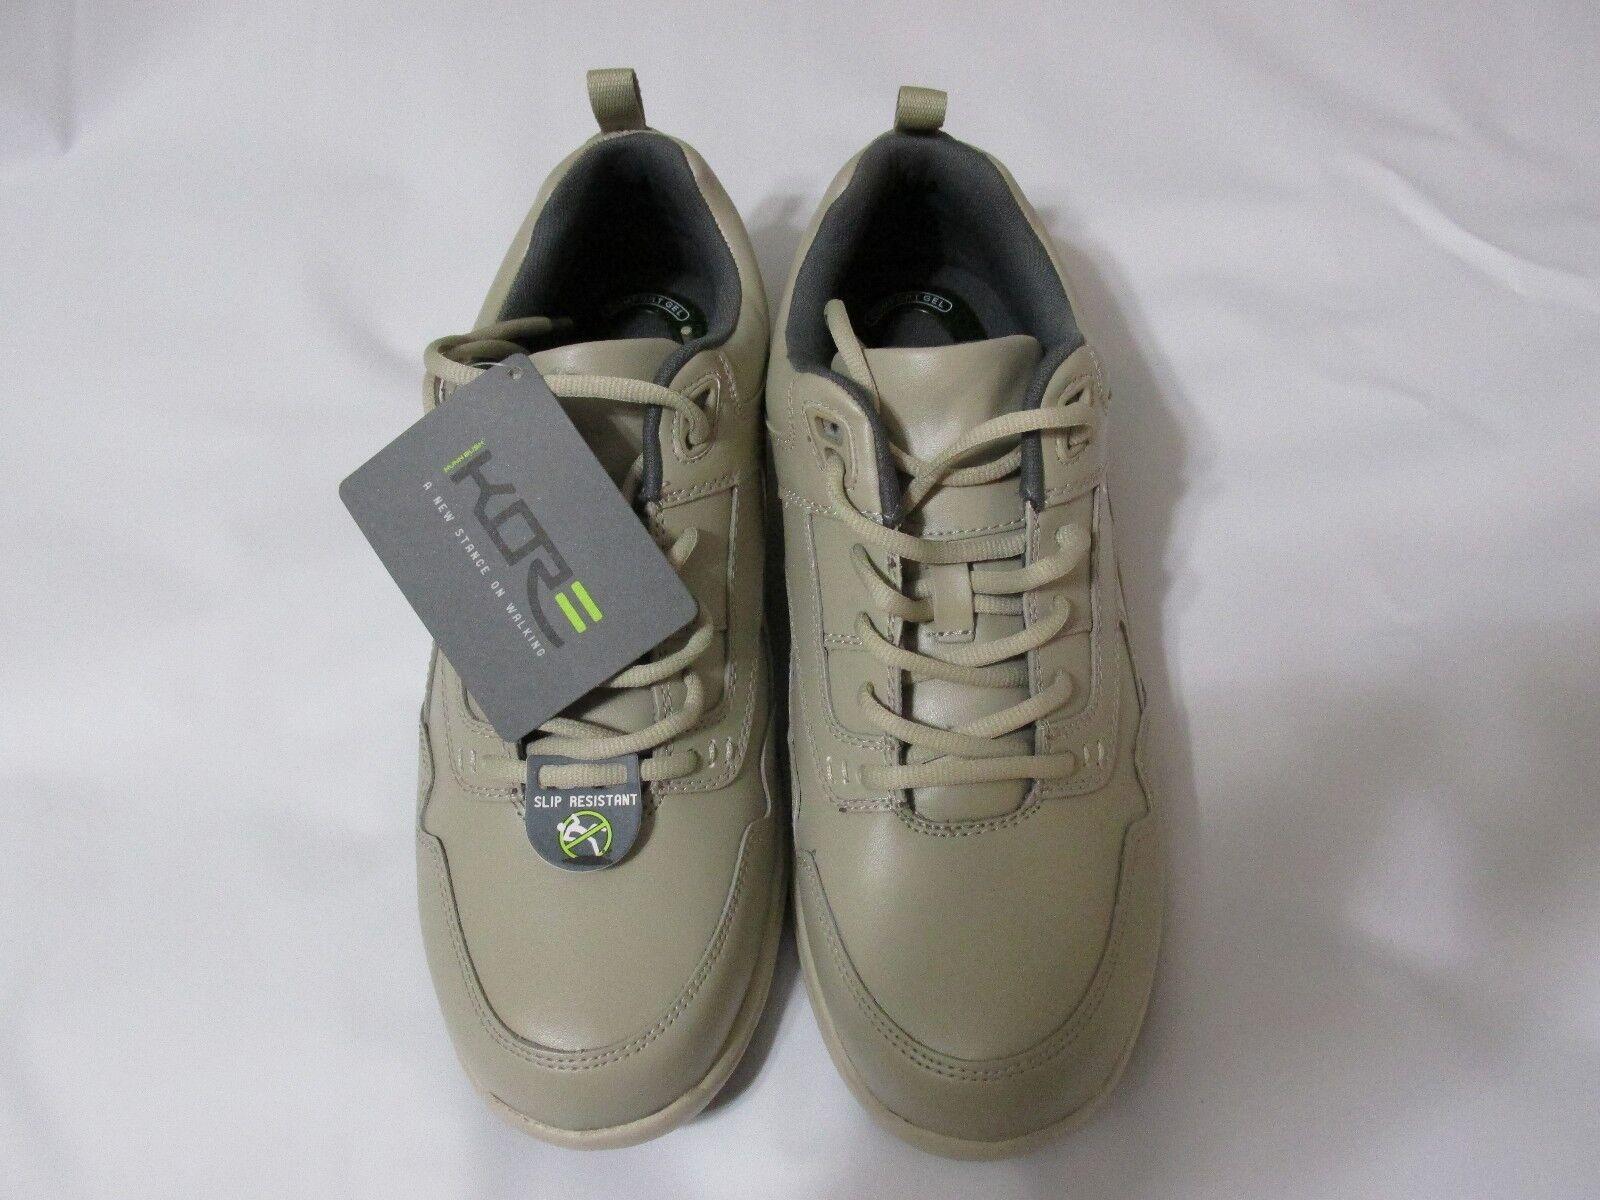 Nunn Bush Kdr Comfort  Gel Men's shoes Size 10 X W , 84339-106